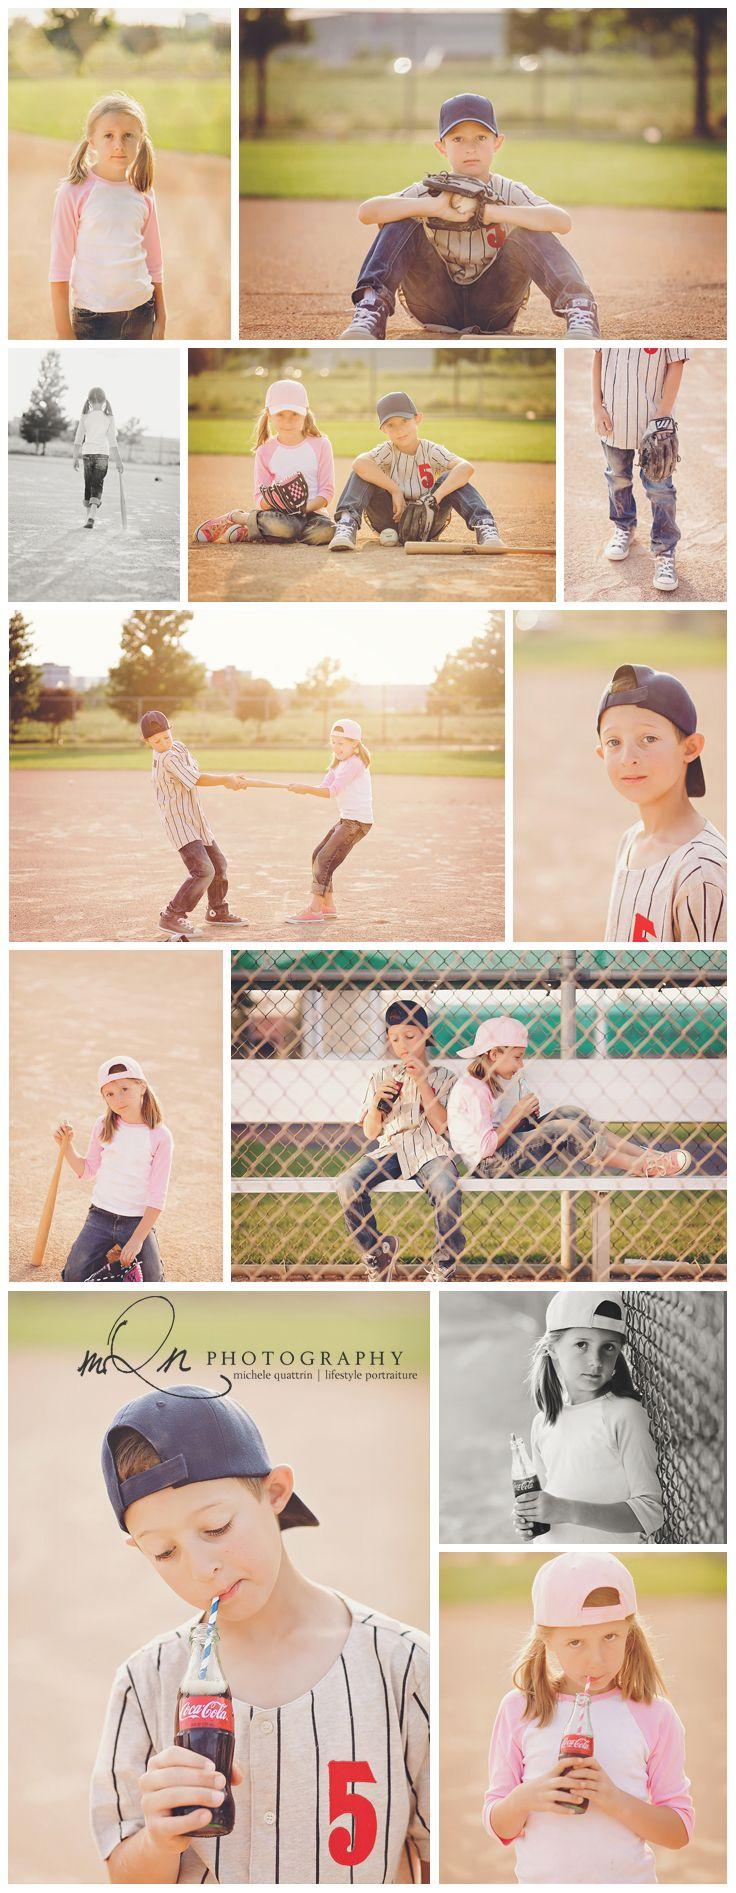 My sandlot :-) baseball showcase with kids